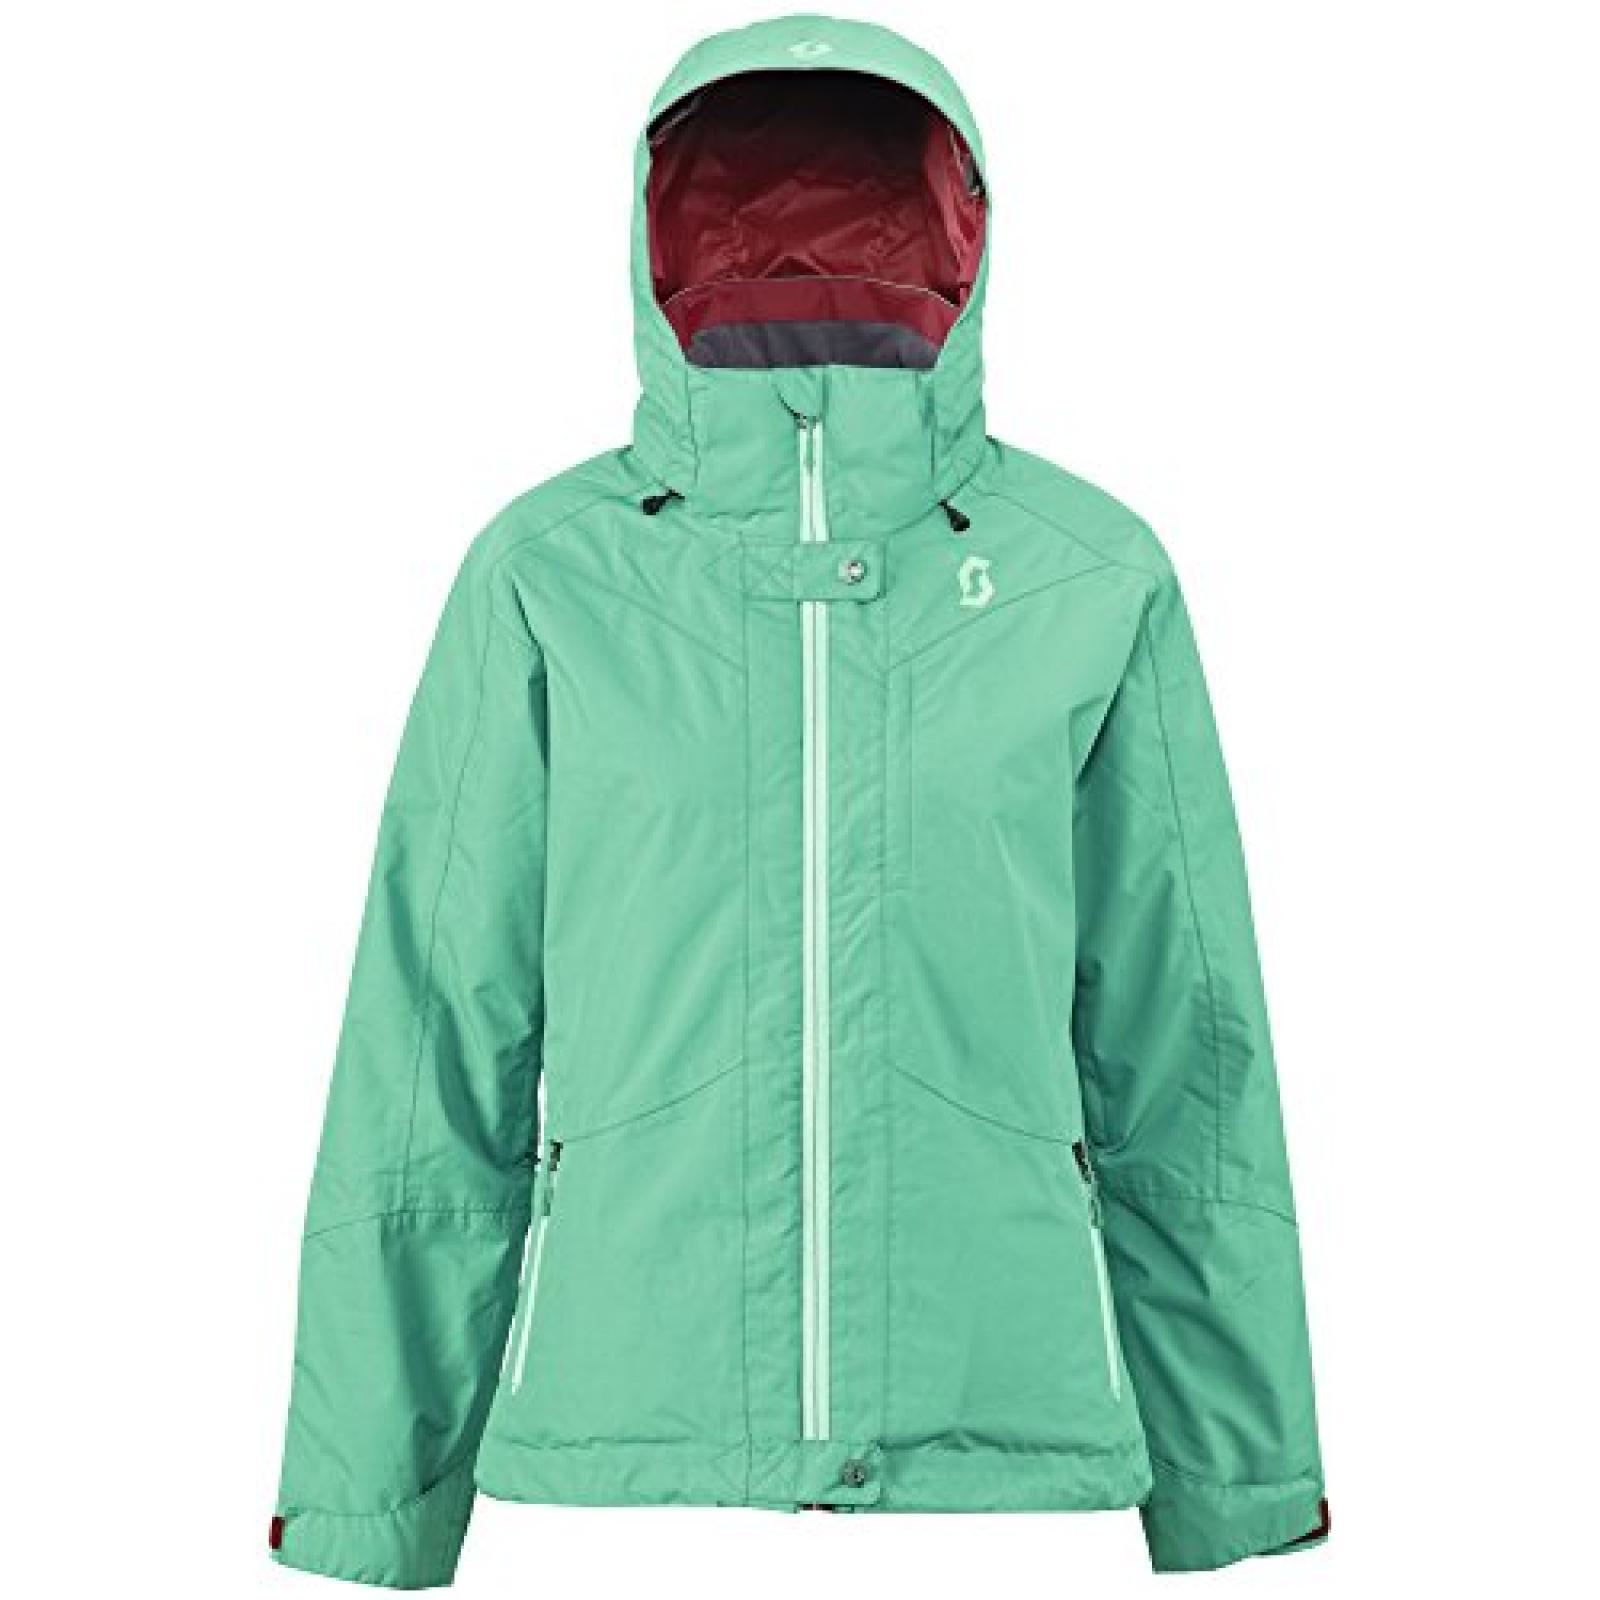 Damen Snowboard Jacke Scott Hollis 100 Jacket